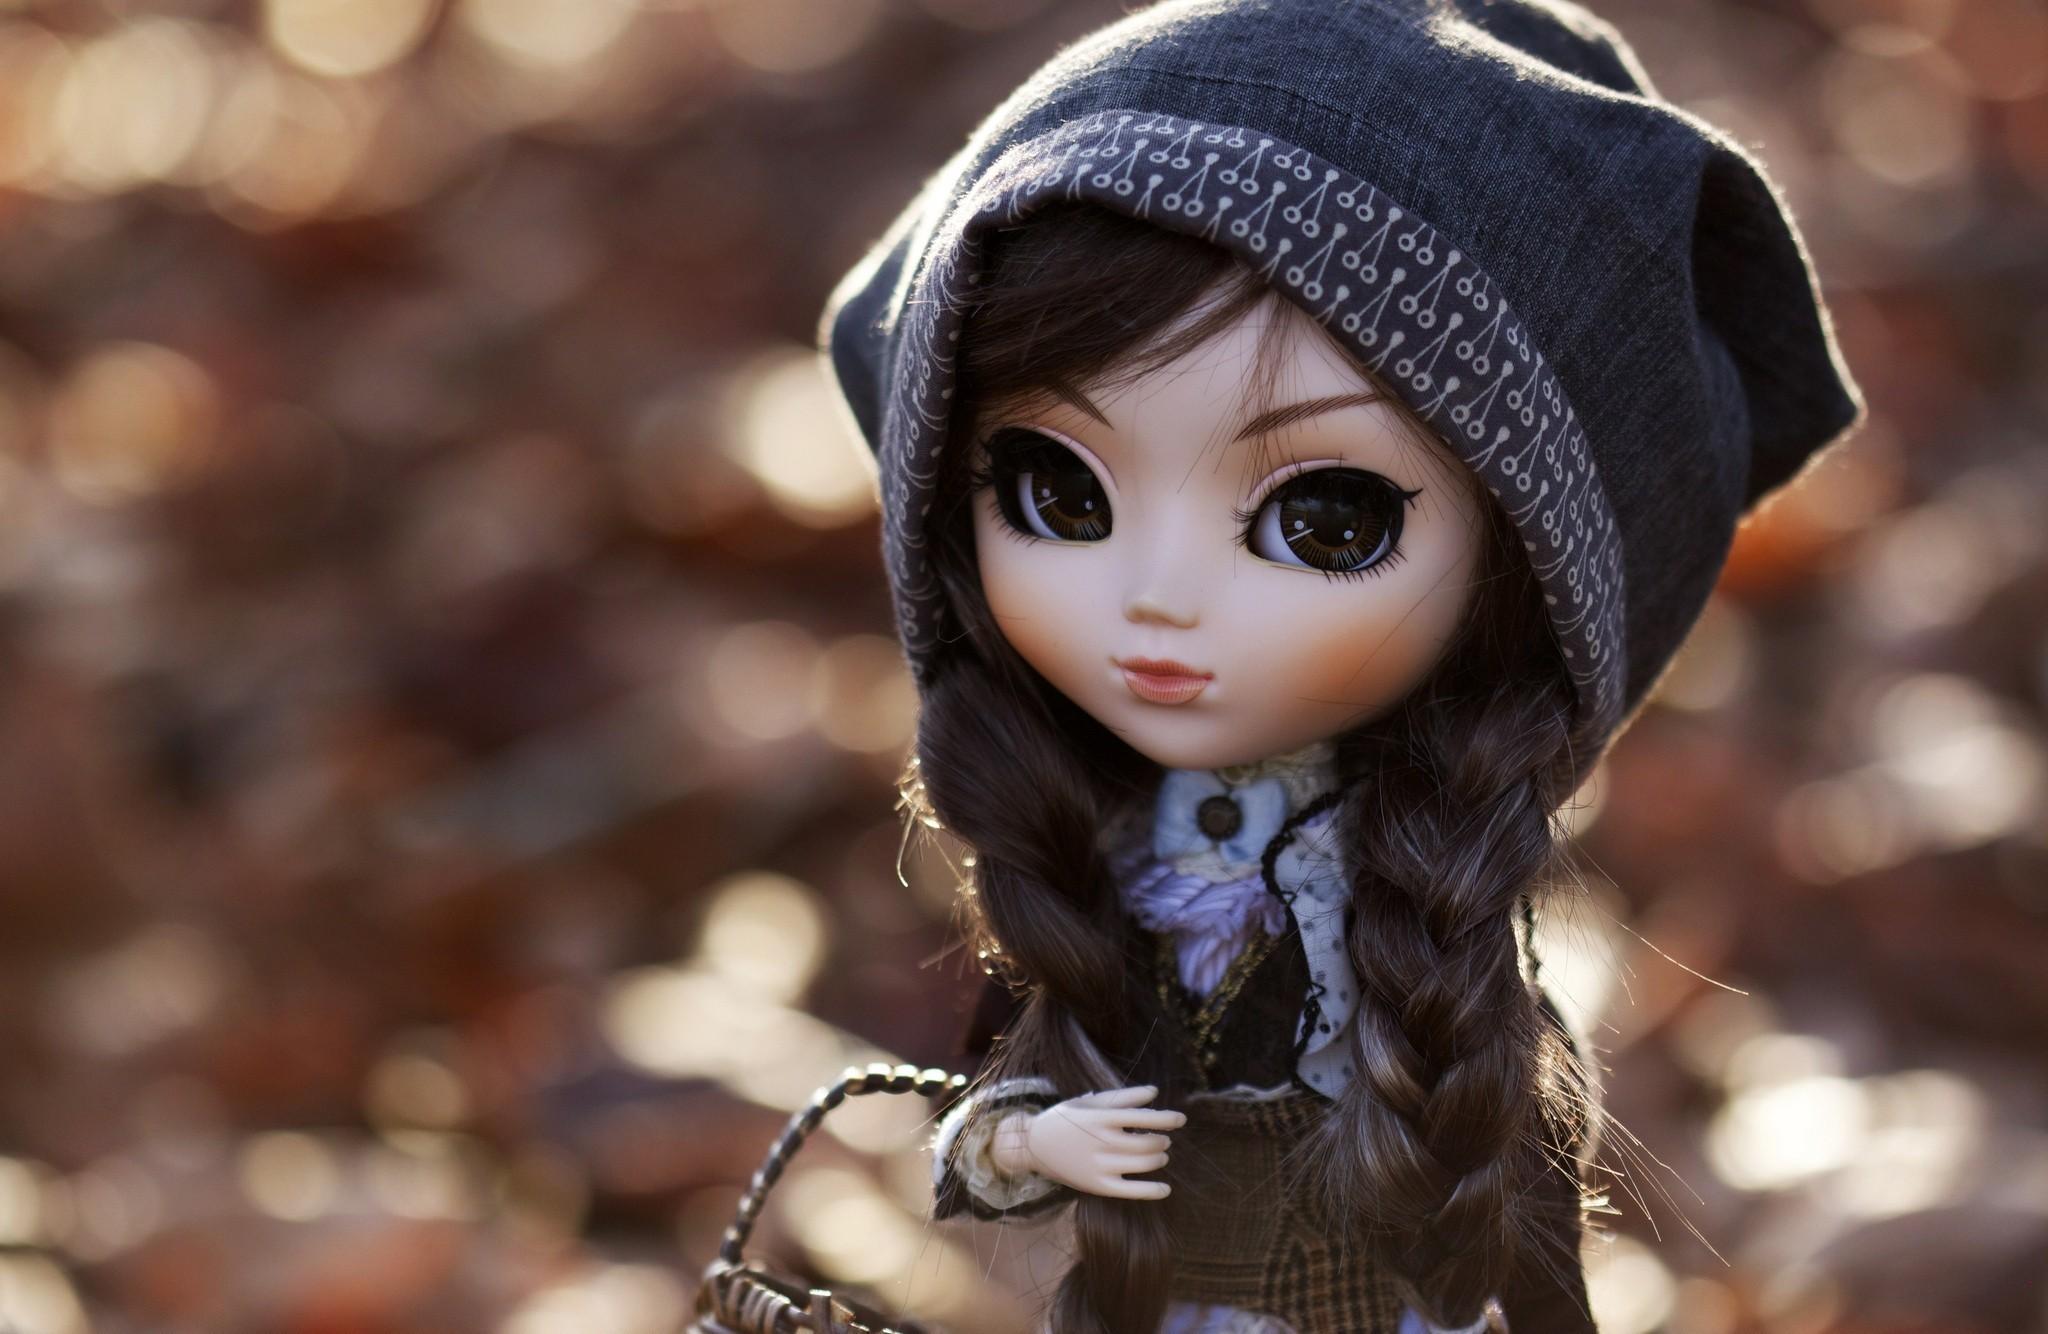 Barbie Doll Wallpaper 62 Images